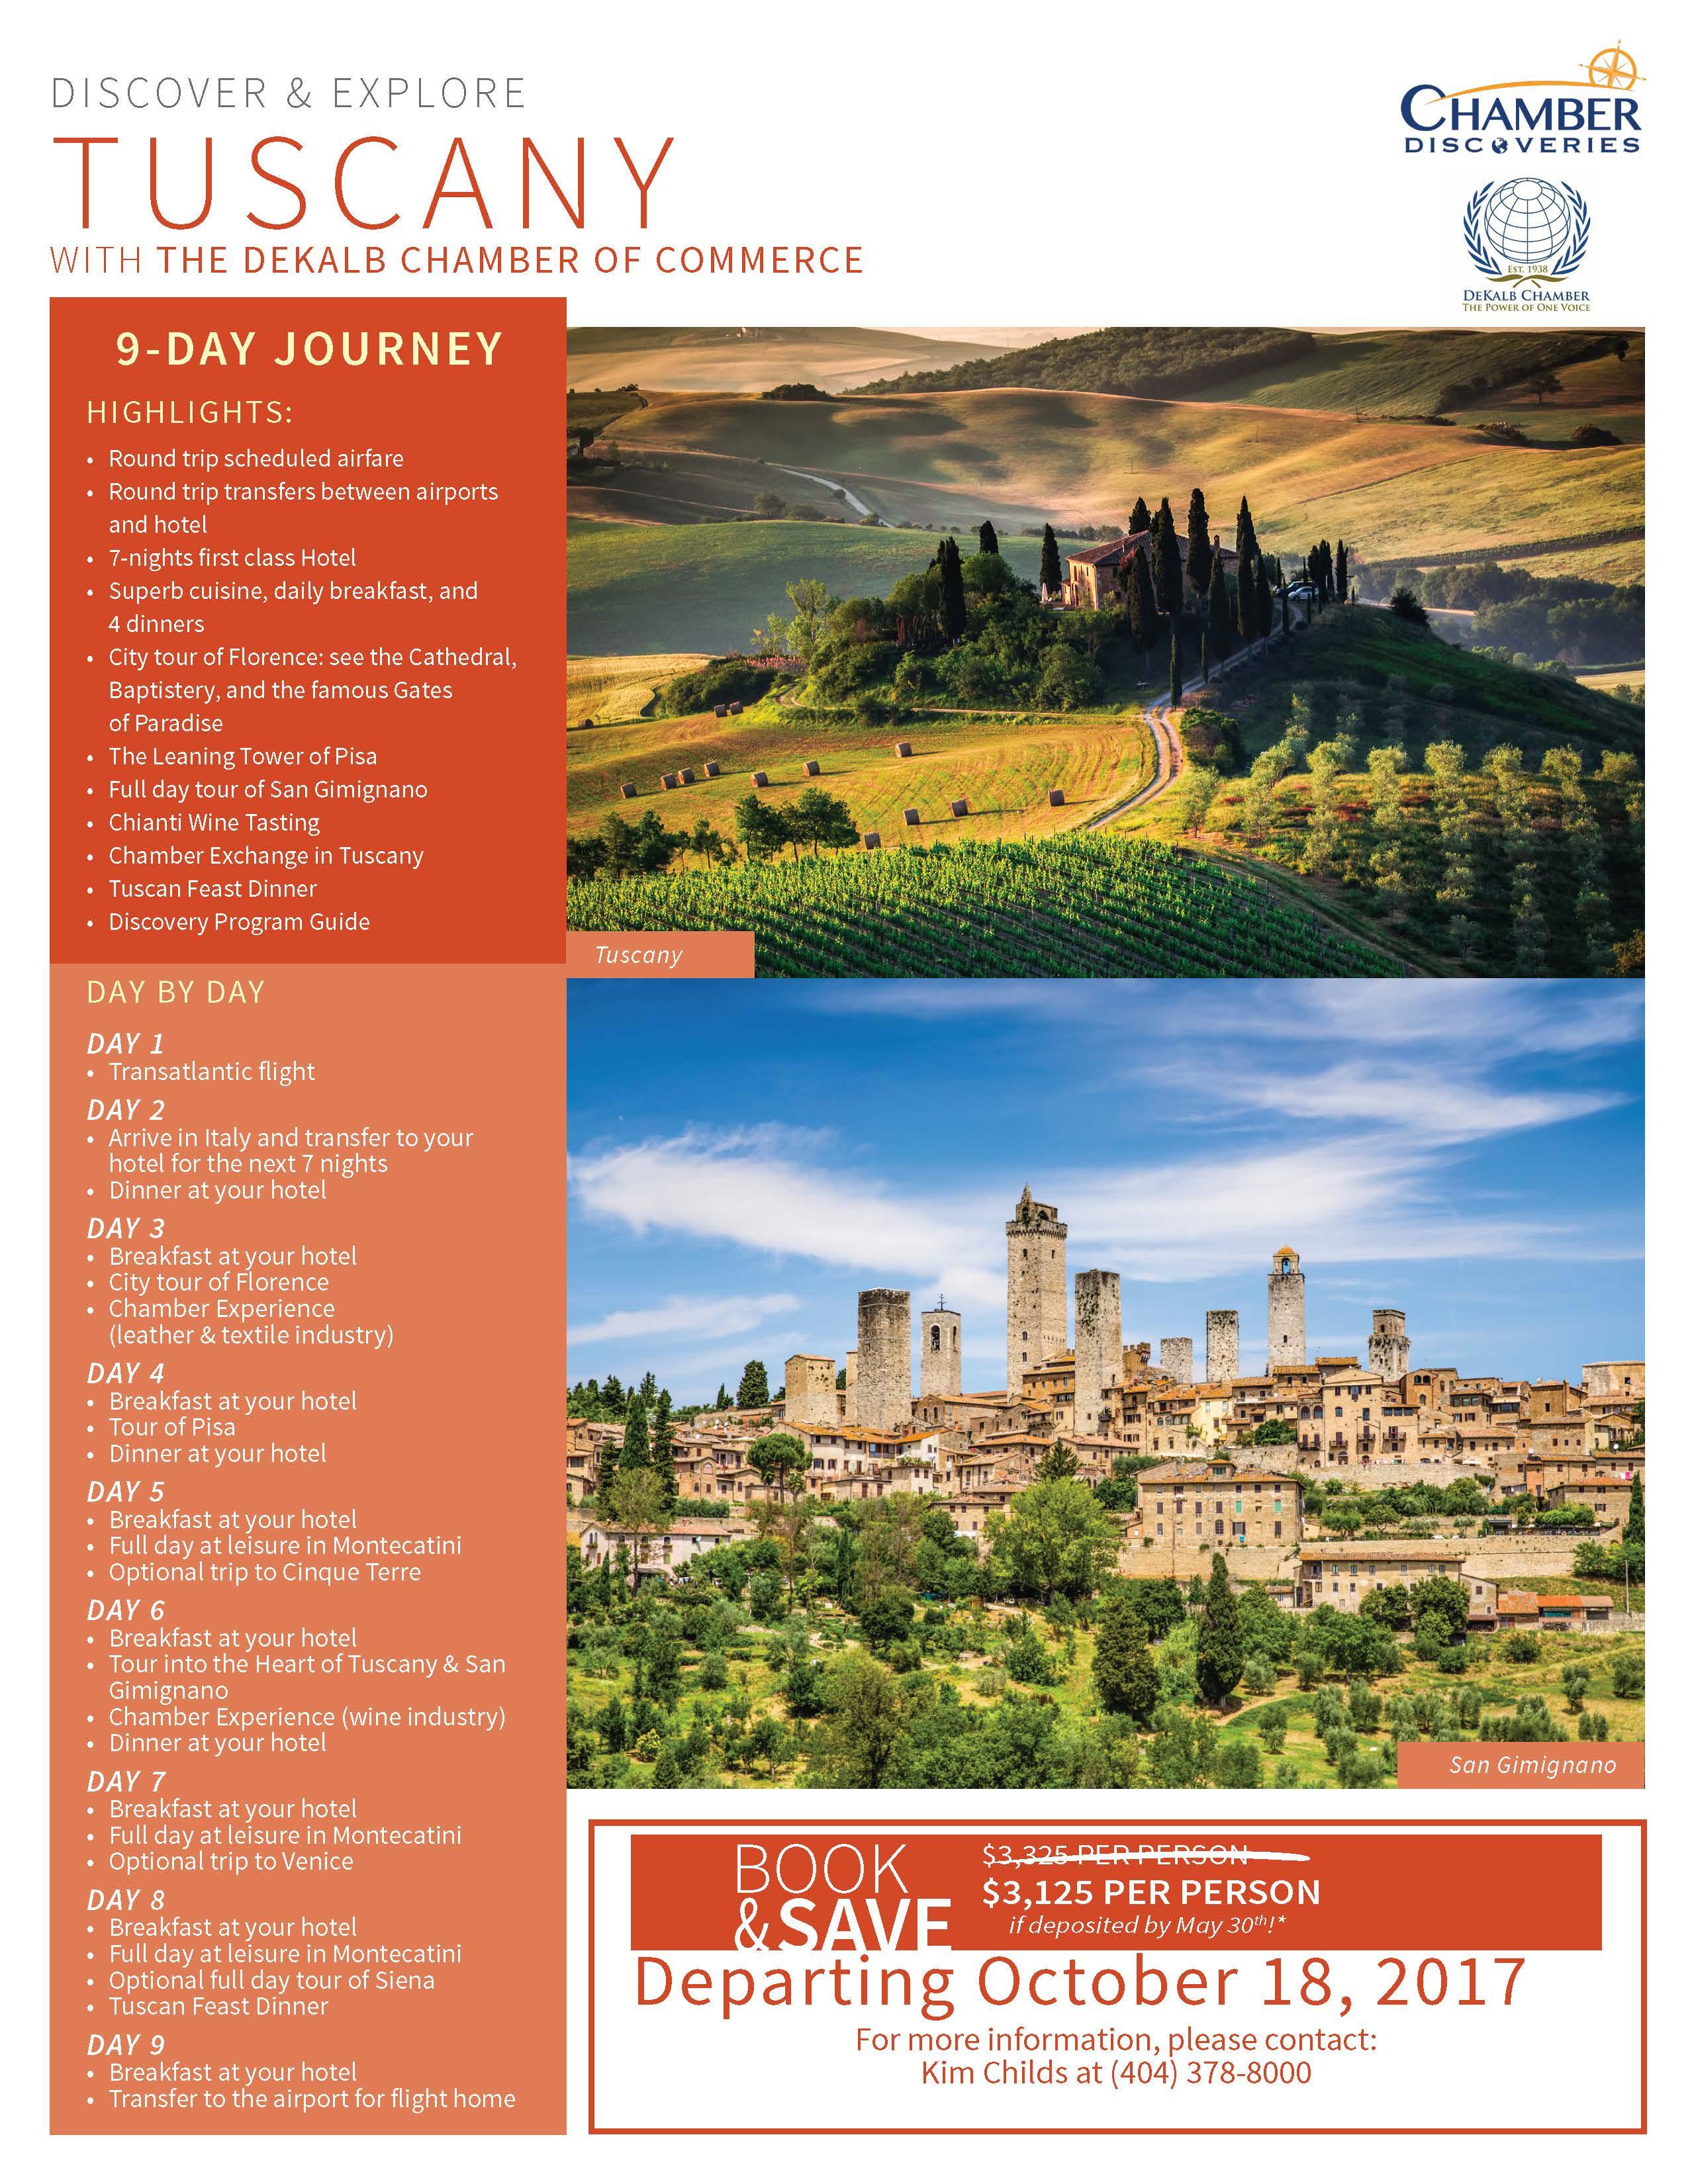 cd tuscany quick flyer dekalb 2017 dekalb chamber of commerce